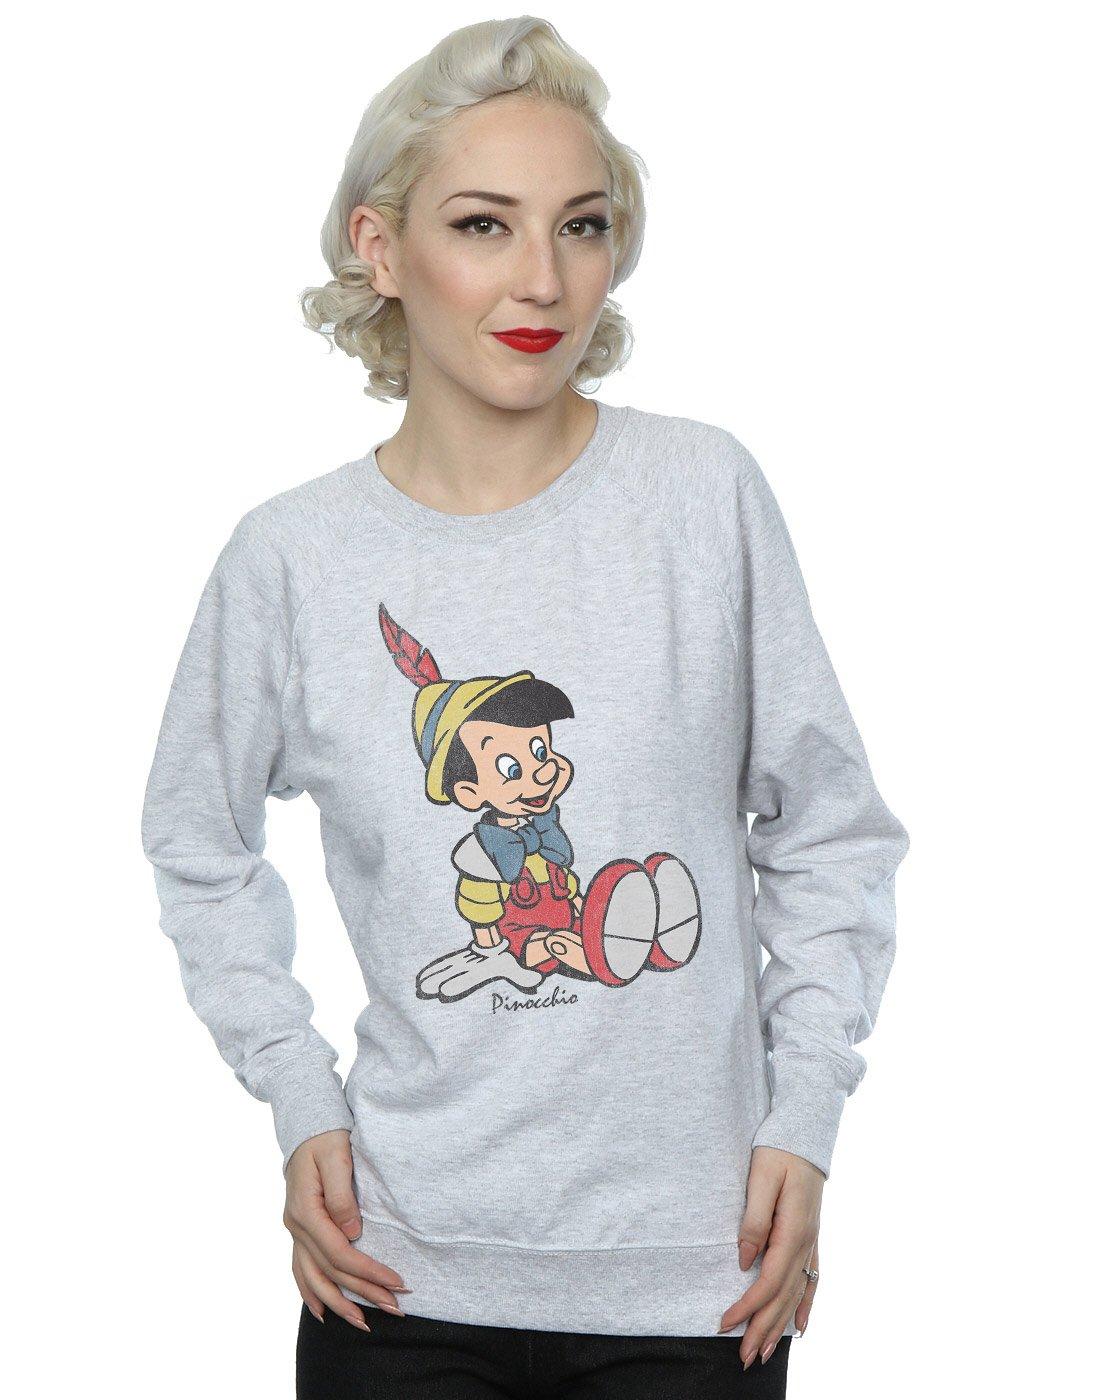 Disney Women's Classic Pinocchio Sweatshirt Small Heather Grey by Disney (Image #1)